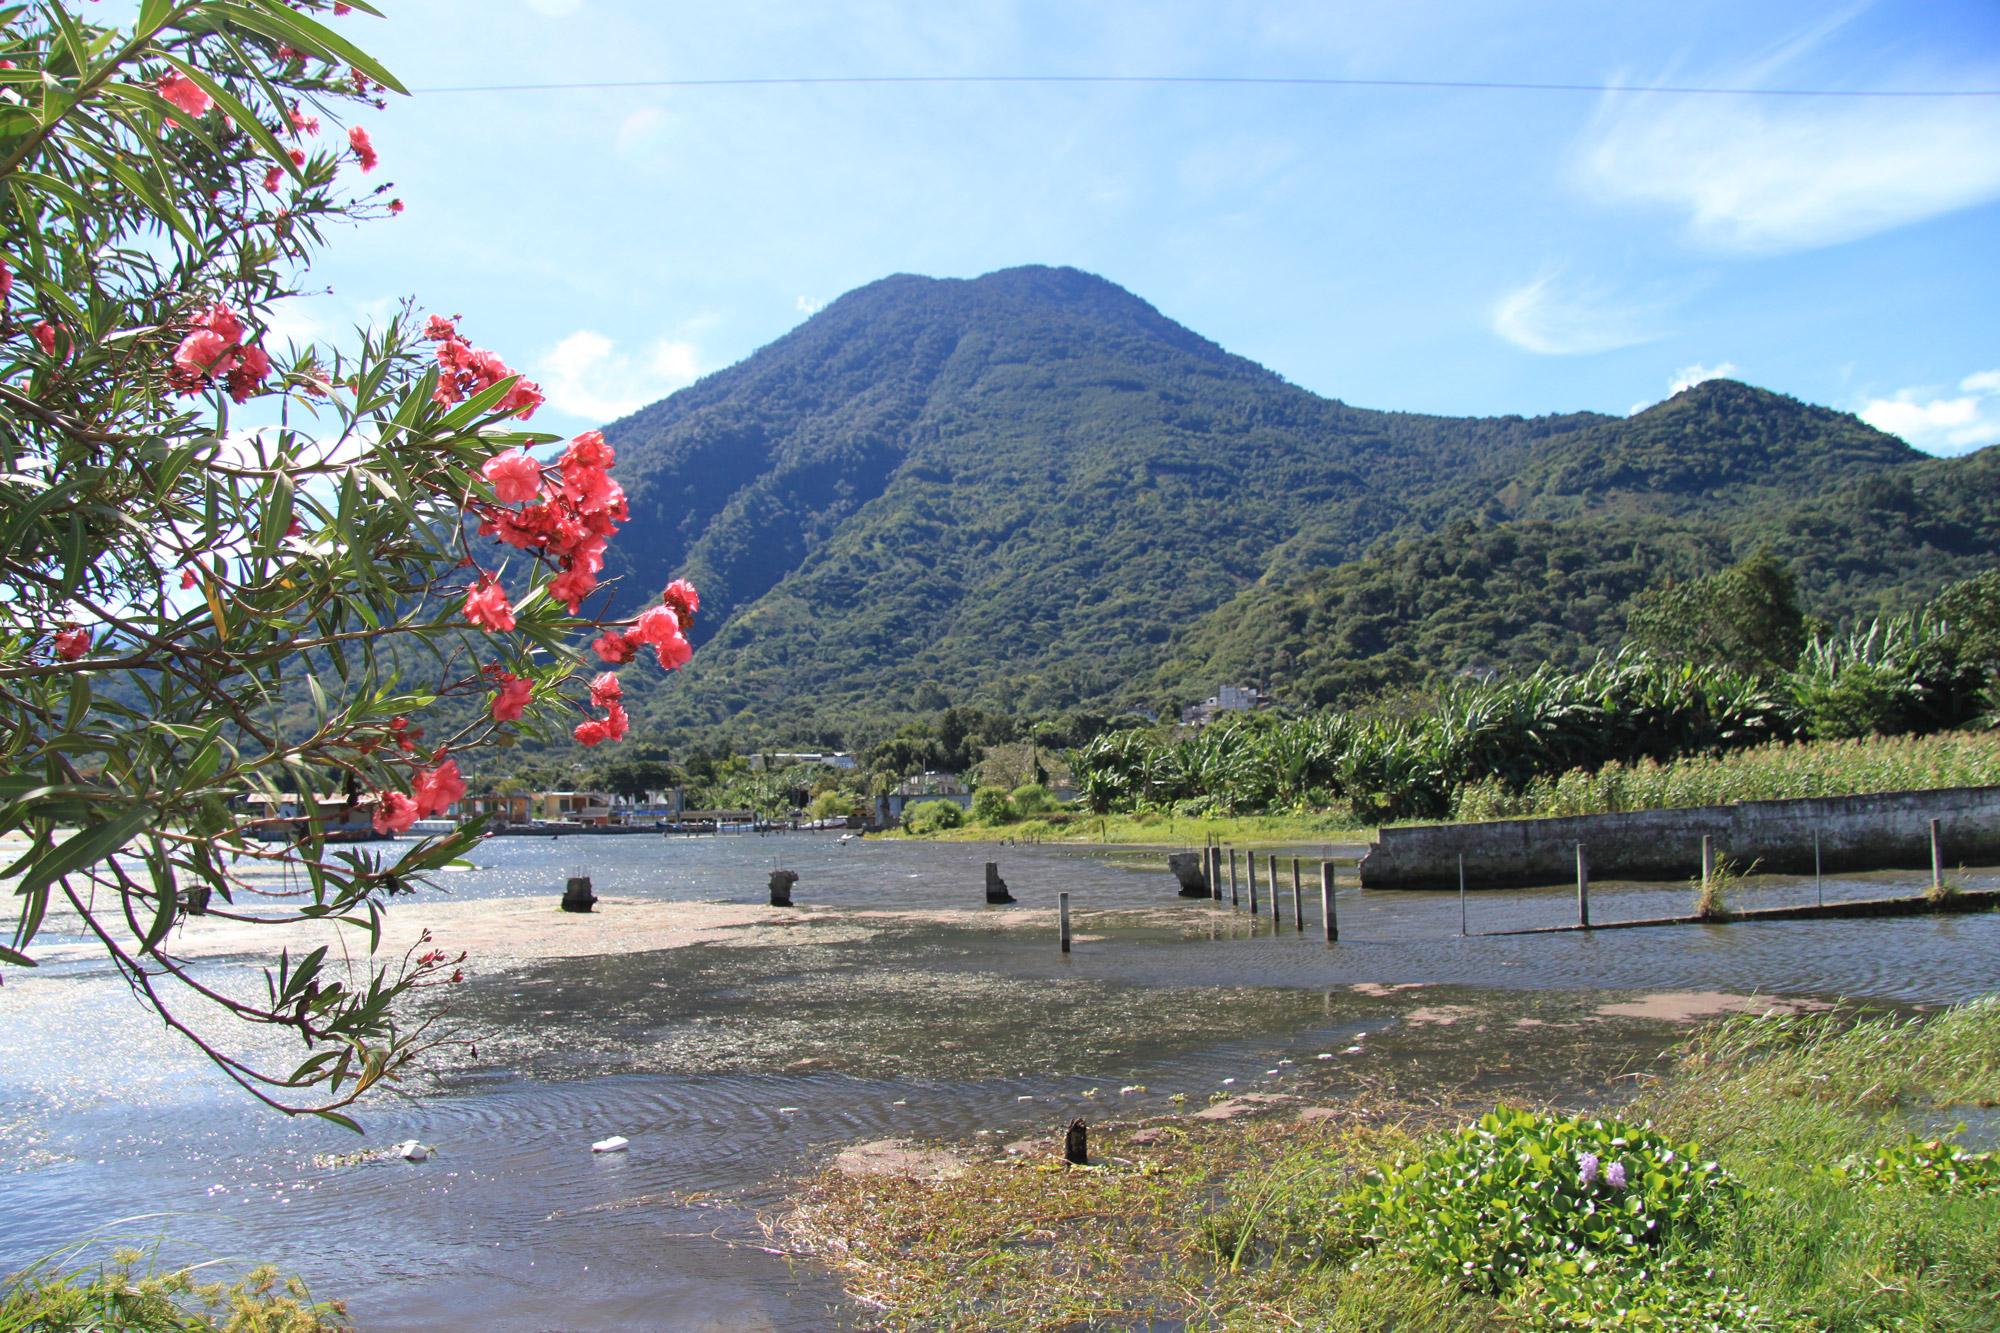 Top 5 vulkanen die je moet beklimmen in Guatemala - Volcán San Pedro